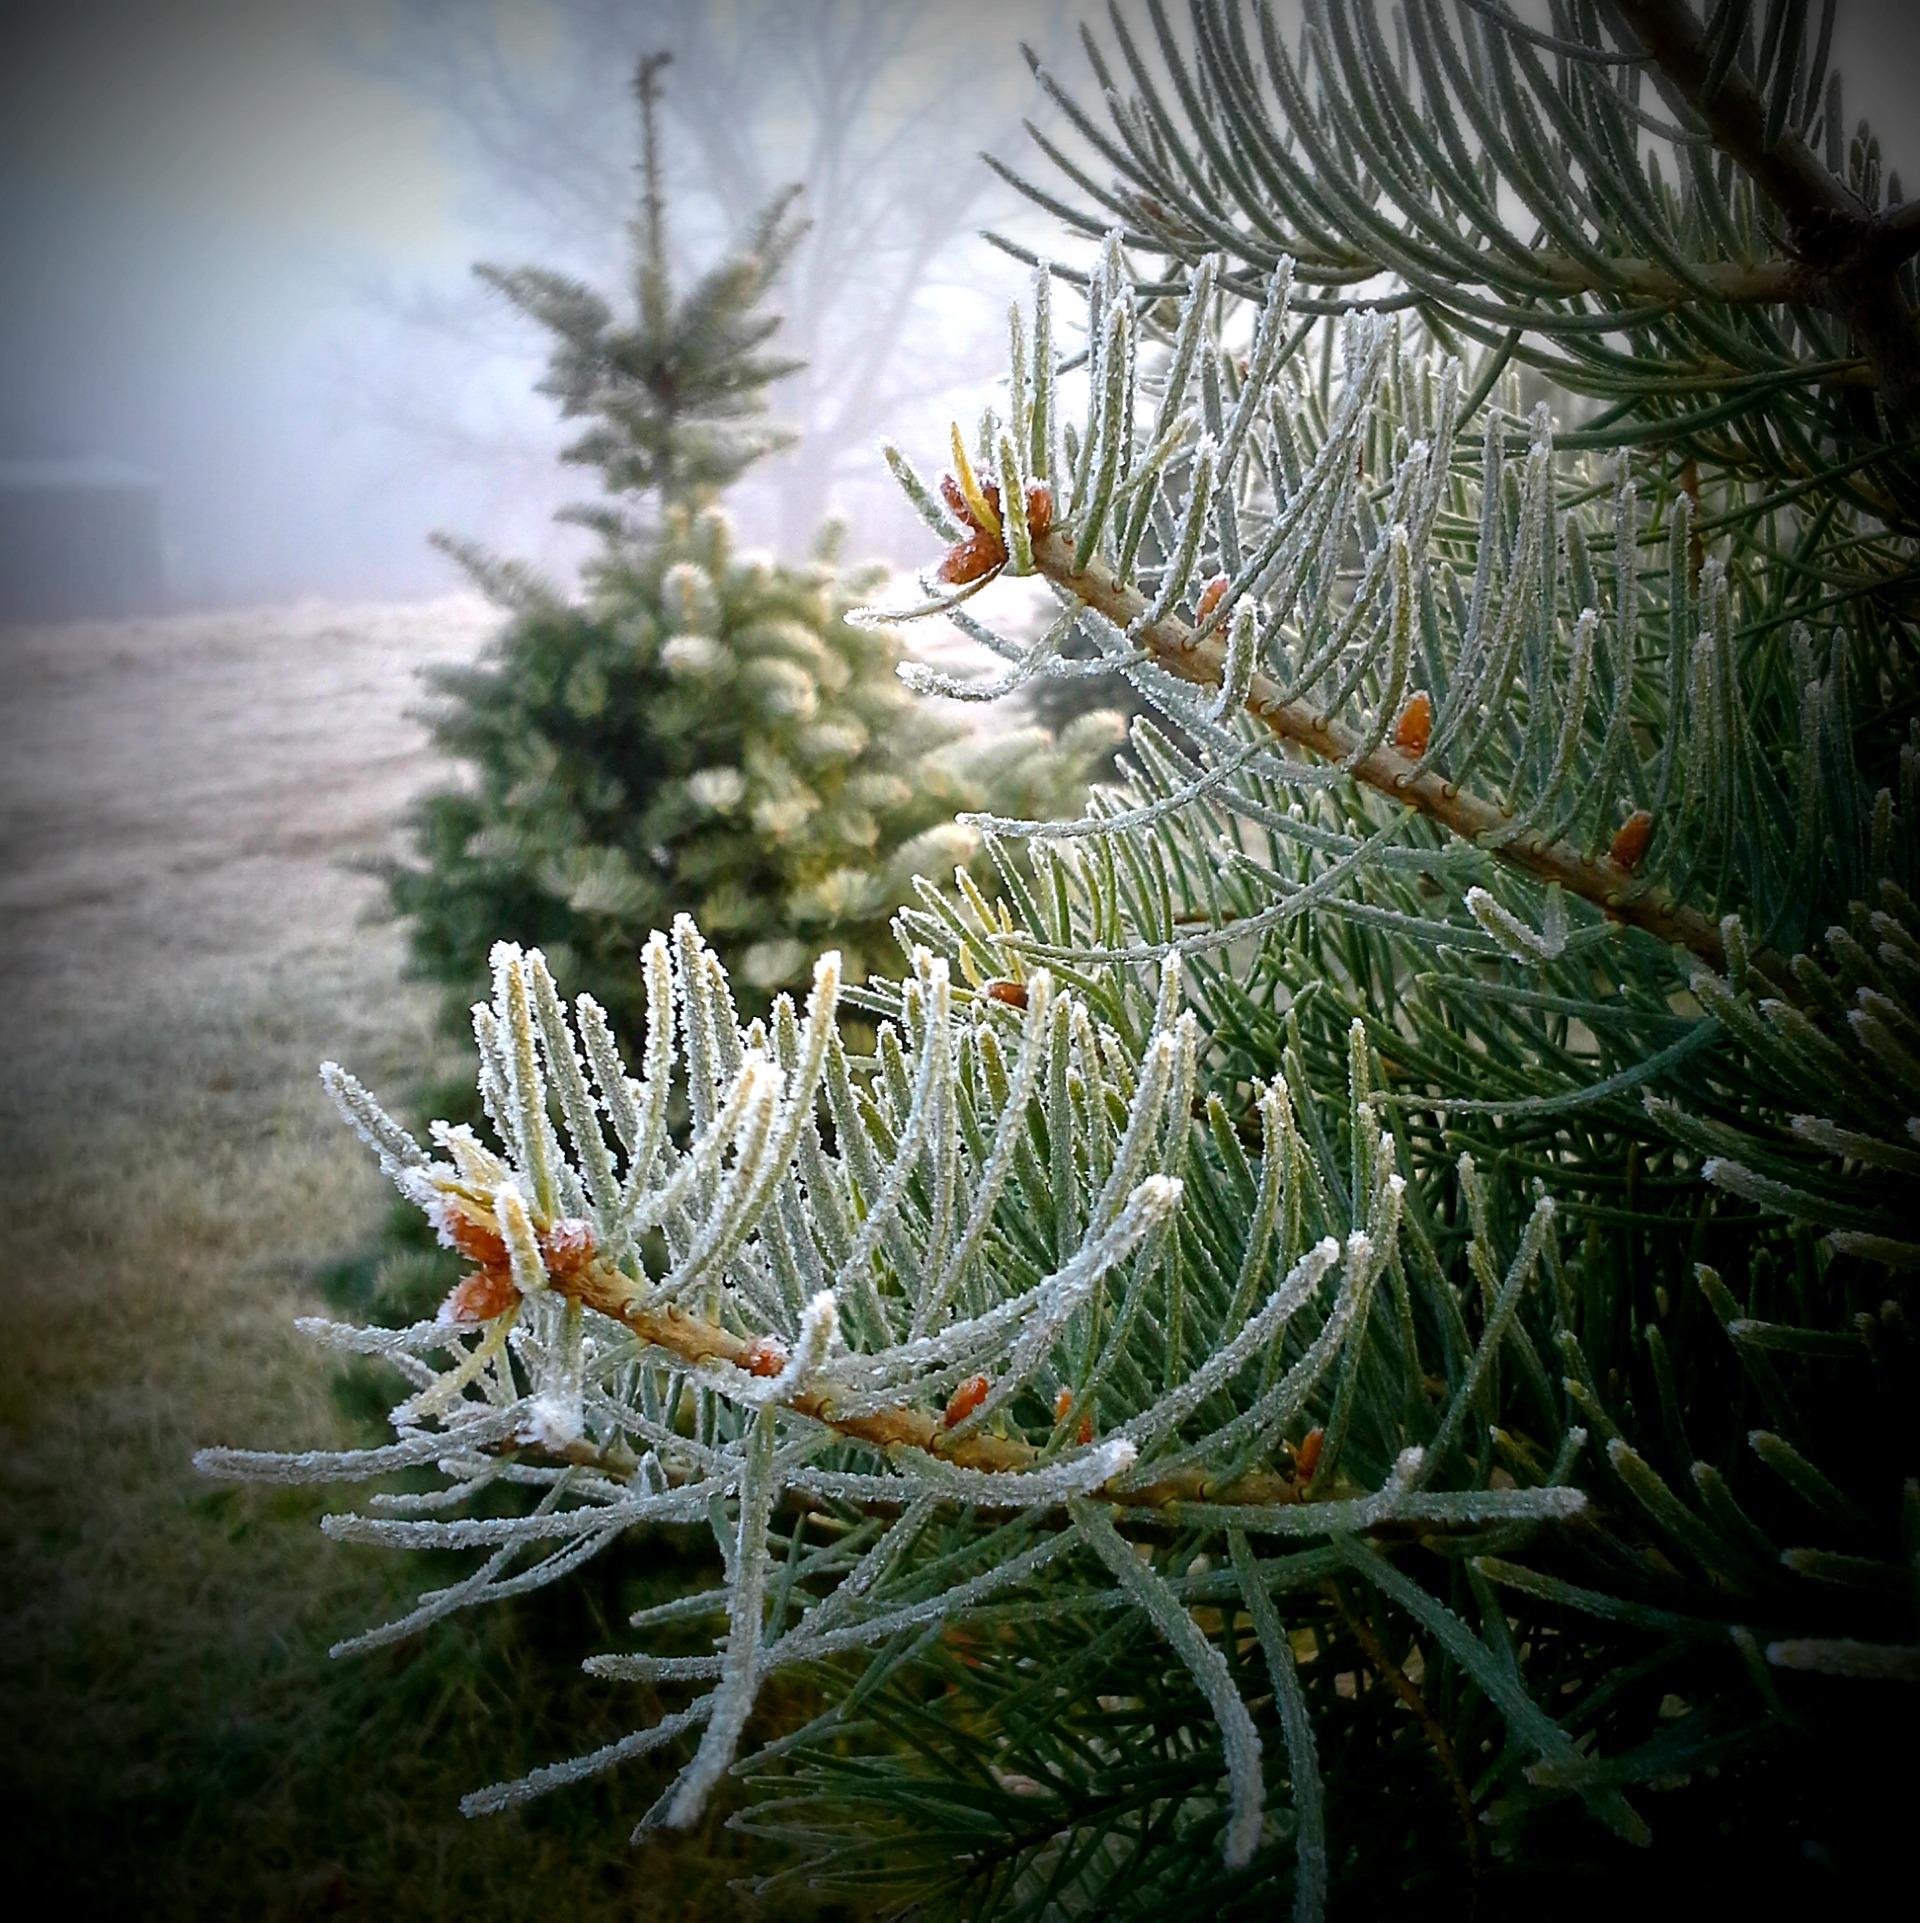 Christmas Tree Needles: Bugs On My Christmas Tree – What?!?